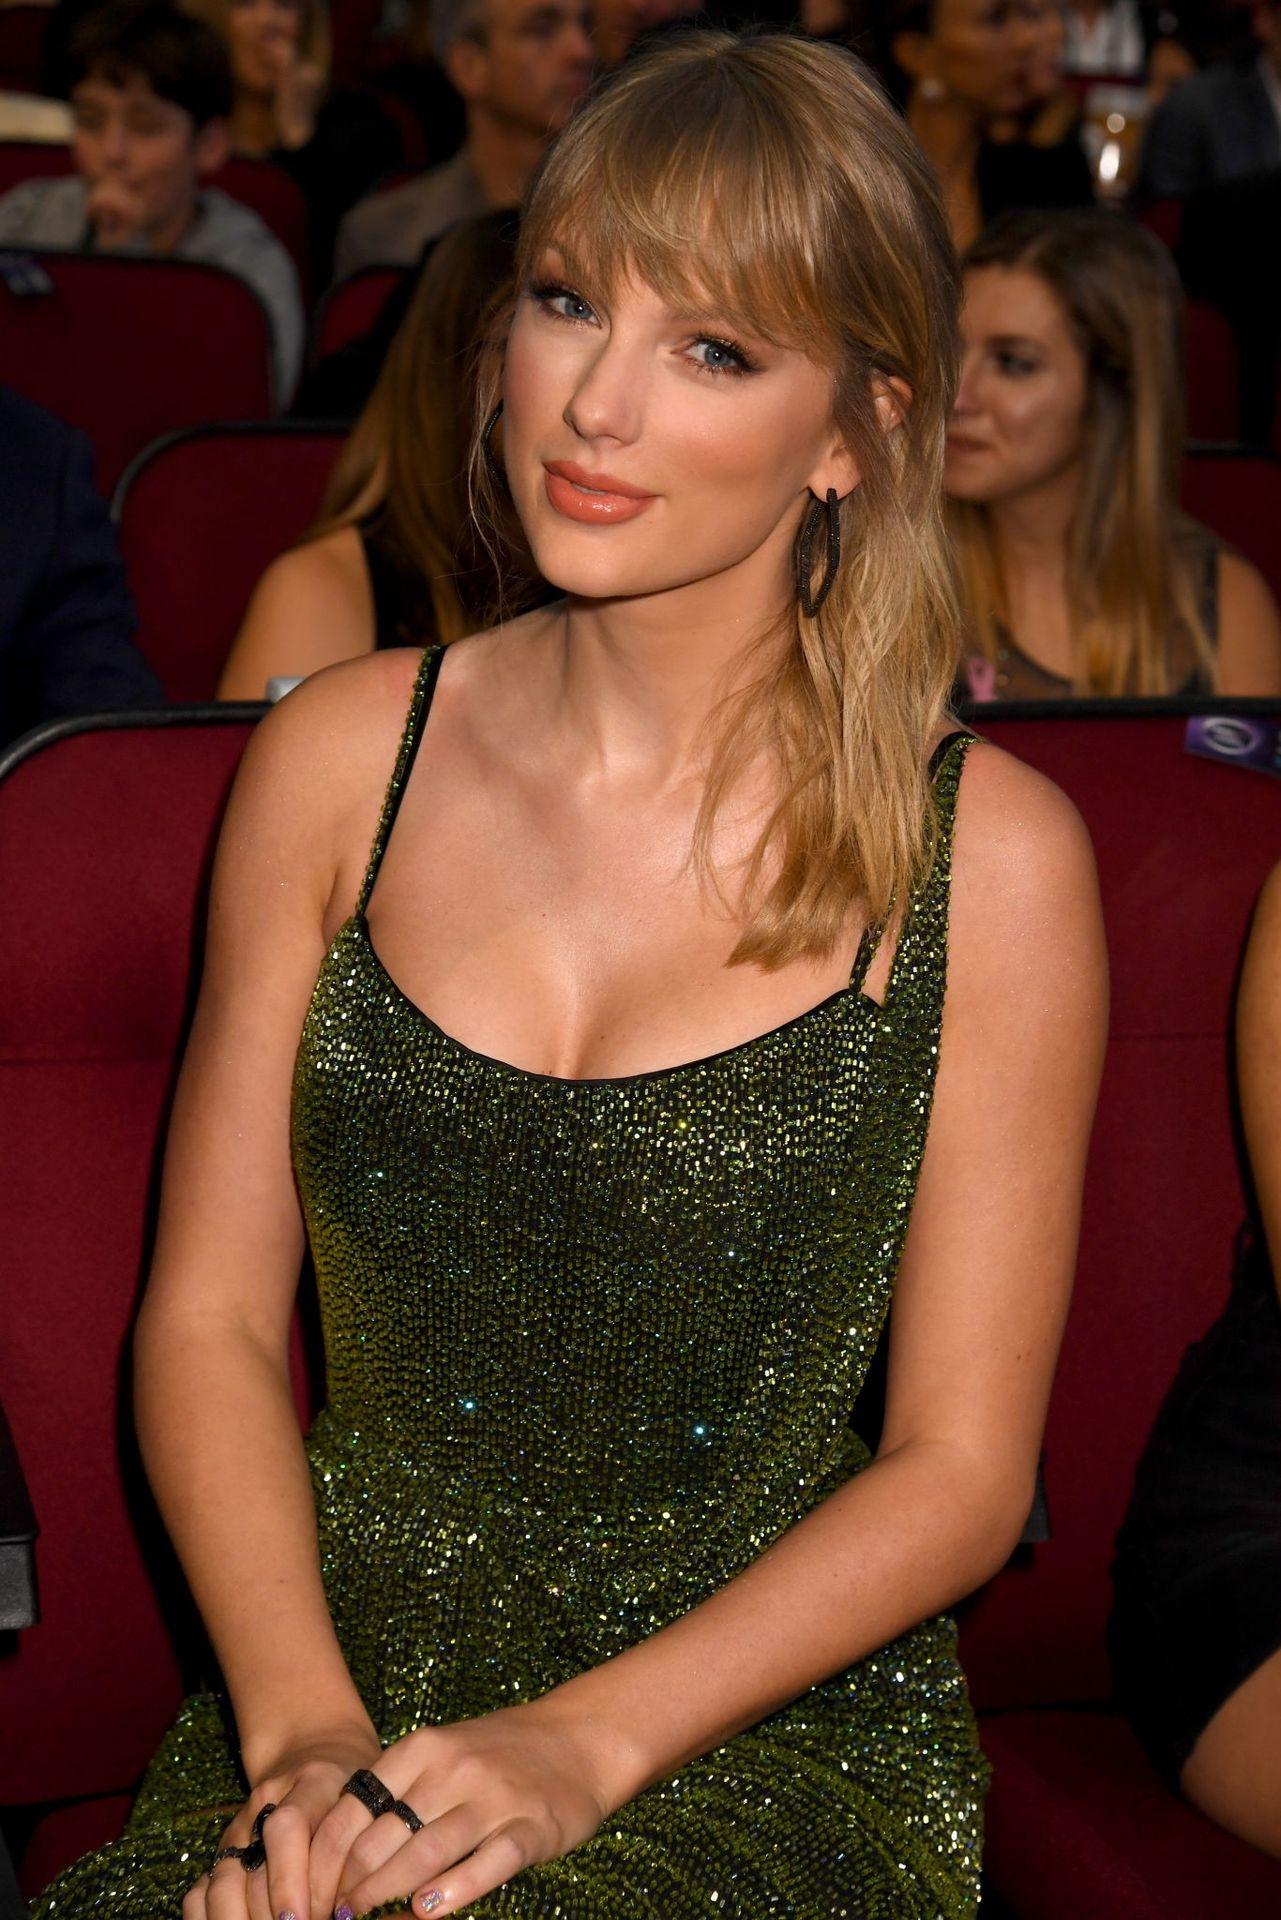 Taylor Swift Sexy 0069